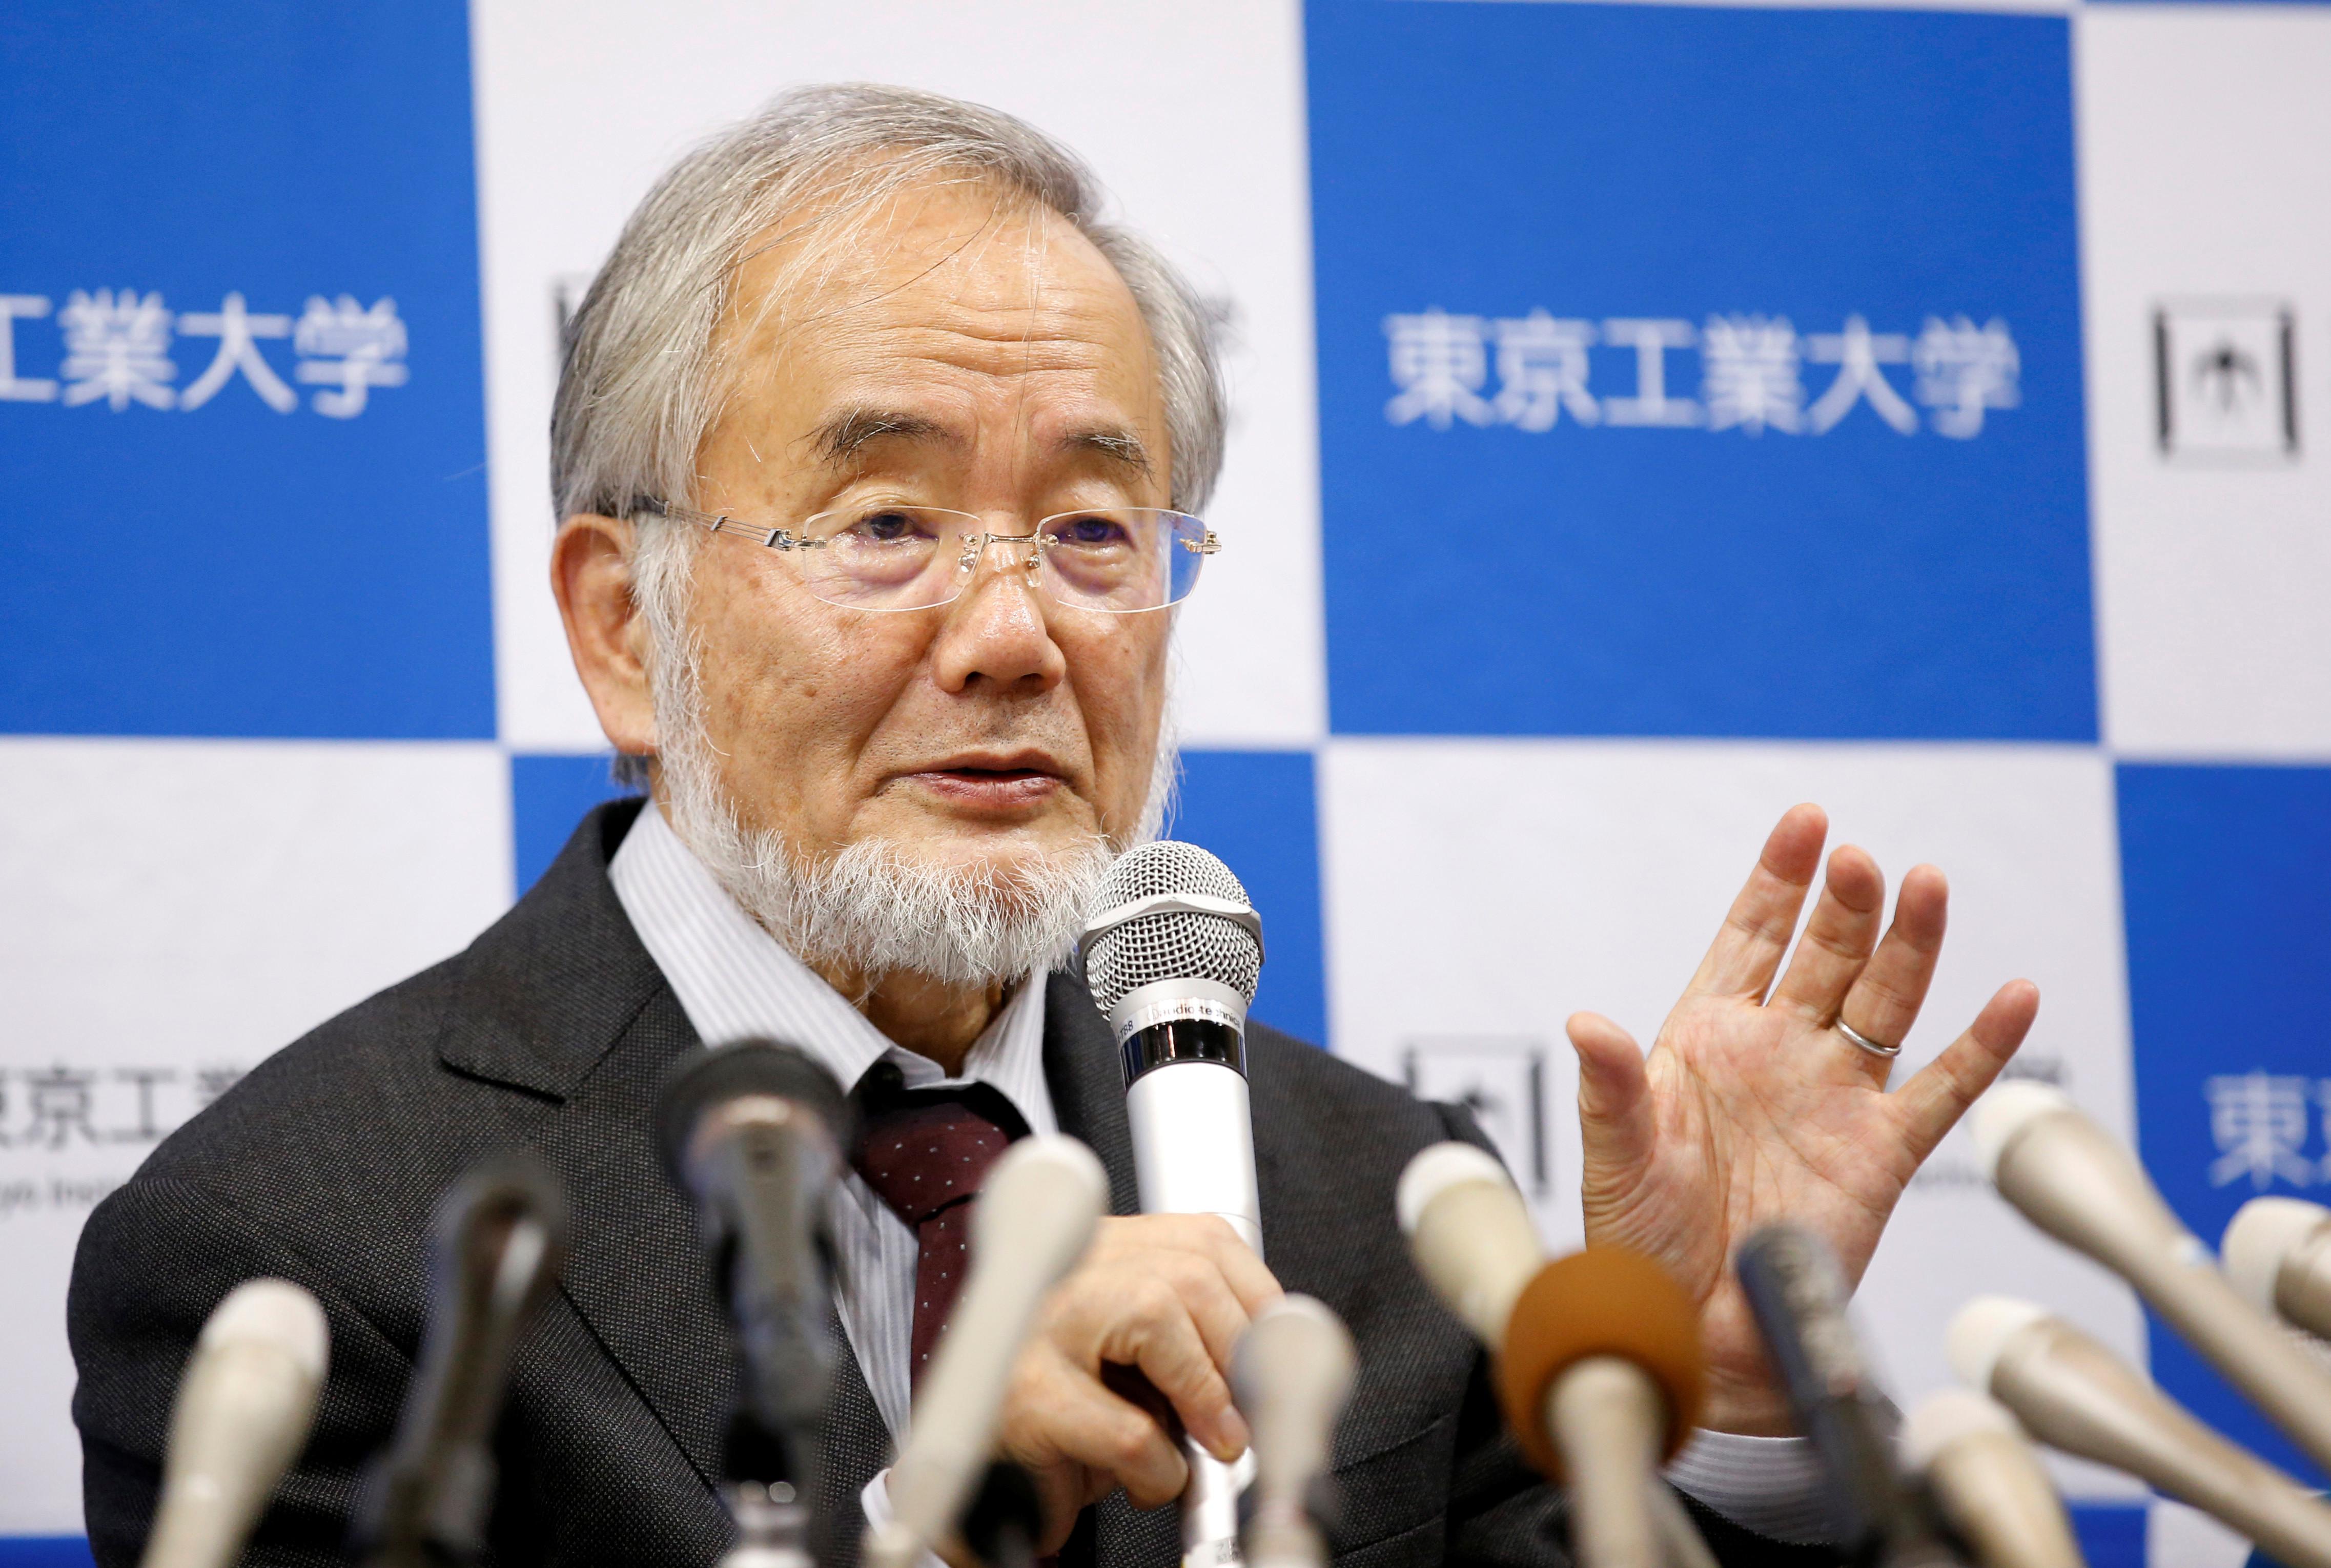 Yoshinori Ohsumi, winner of the Nobel Prize for Medicine